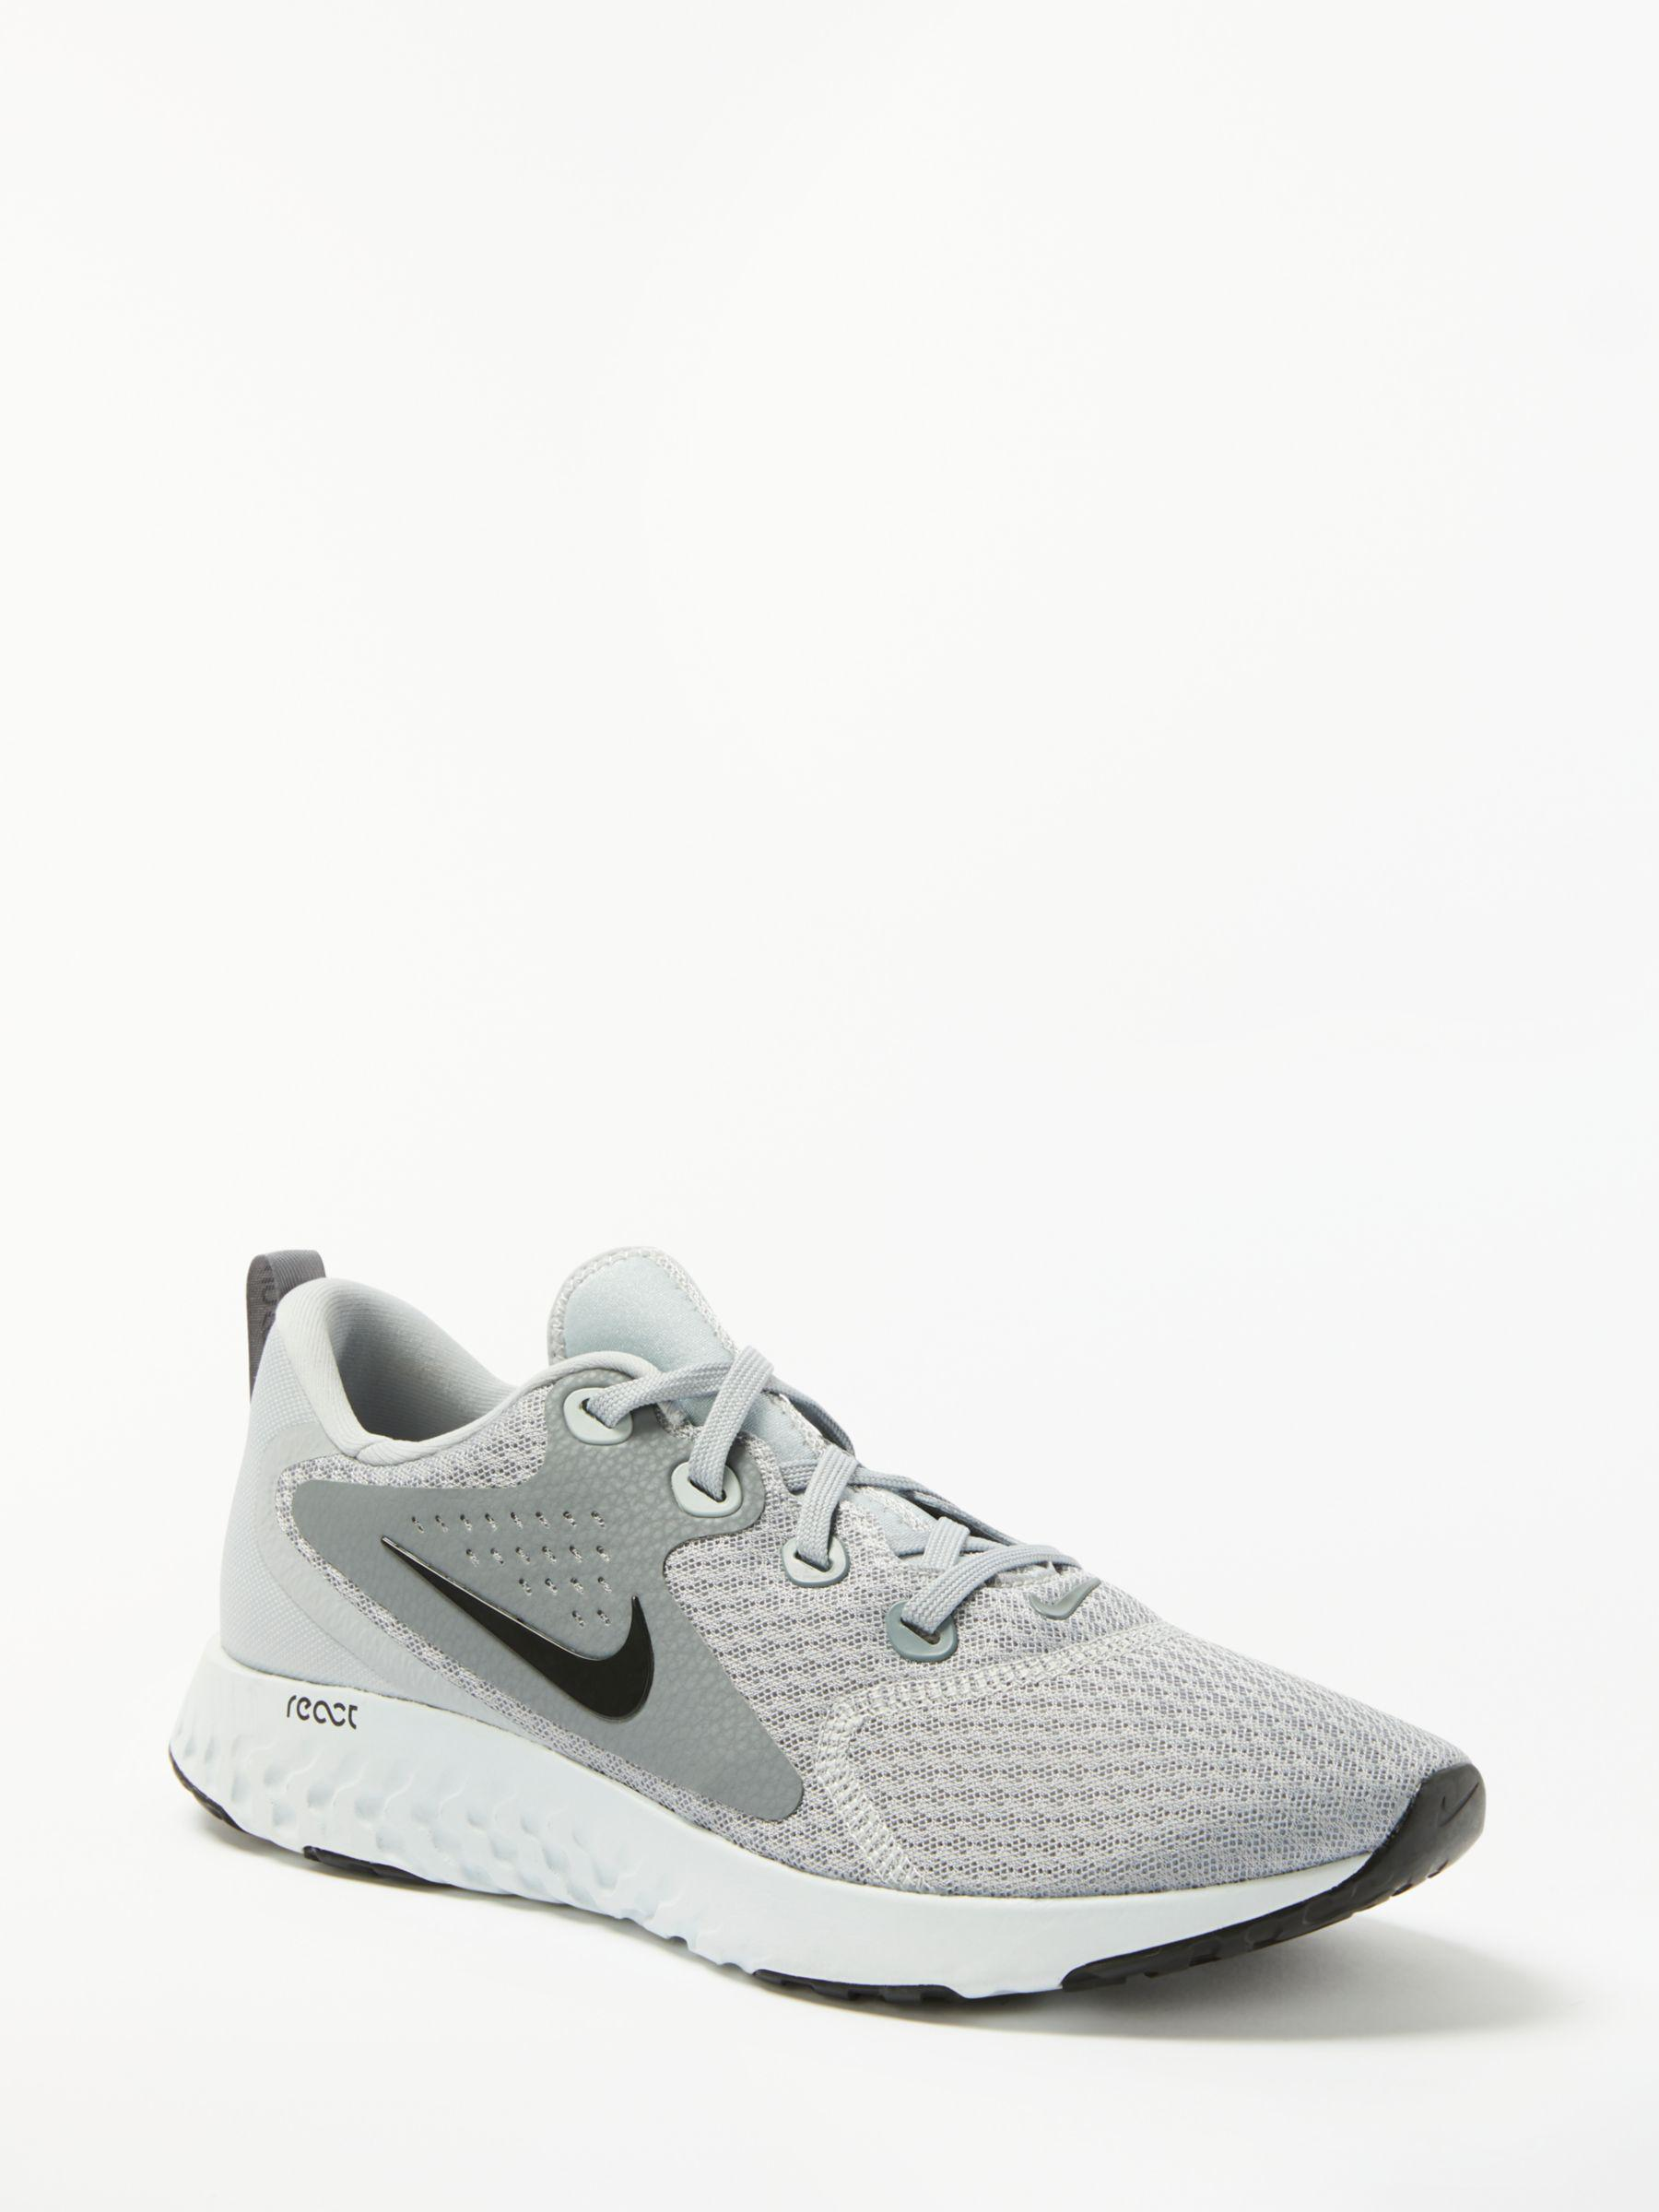 6509298f4aeb7d Nike Legend React Men s Running Shoe in Gray for Men - Lyst